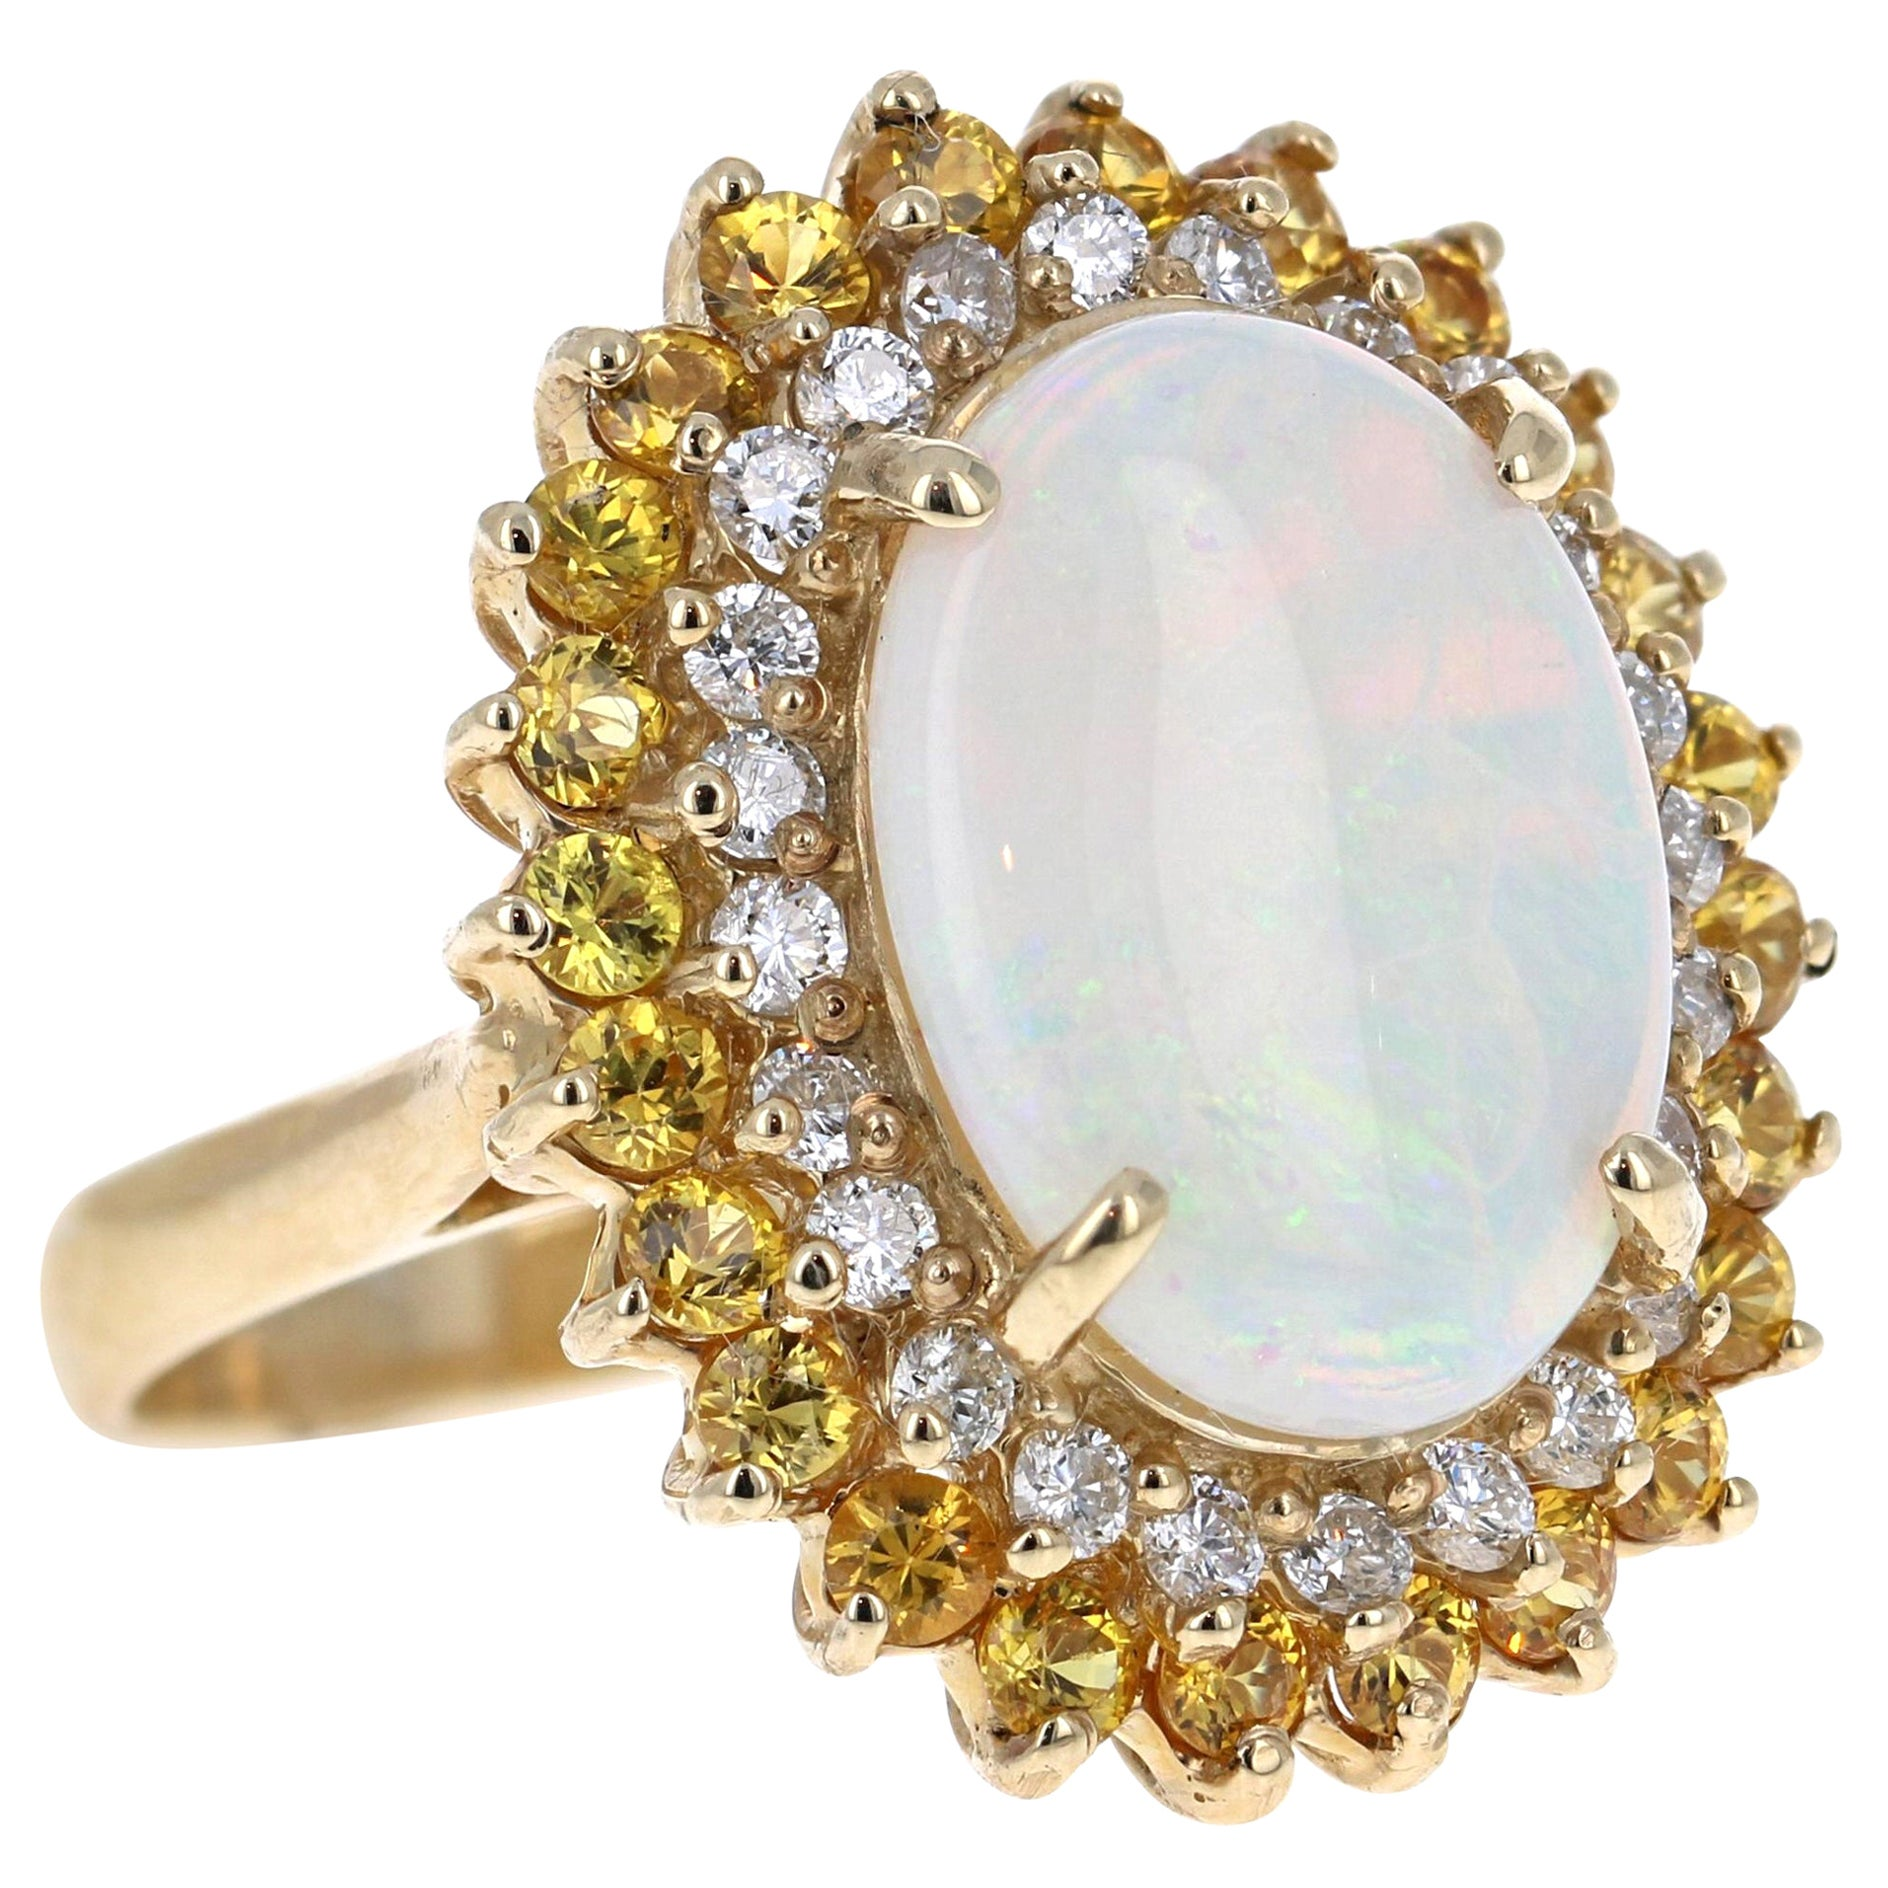 5.70 Carat Opal Yellow Sapphire and Diamond 14 Karat Yellow Gold Cocktail Ring